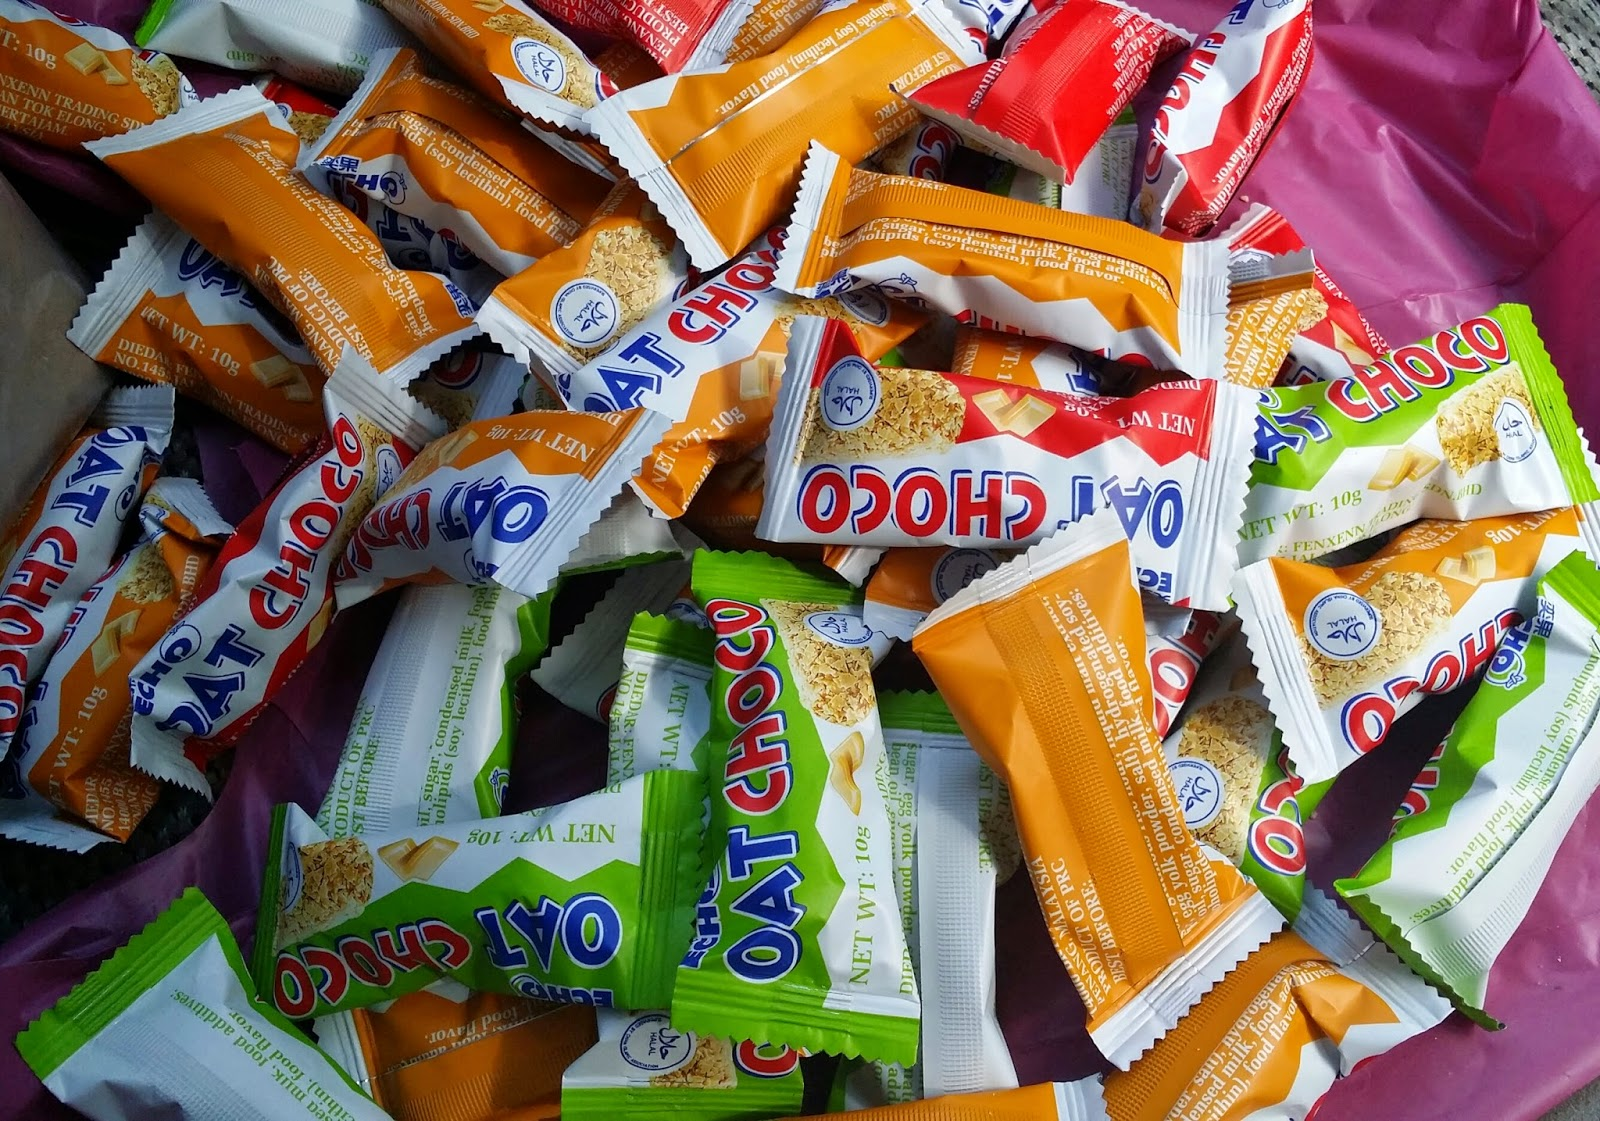 Biskut Crunch Oat | Info | Shaklee | Sungai Buloh | Setiawangsa